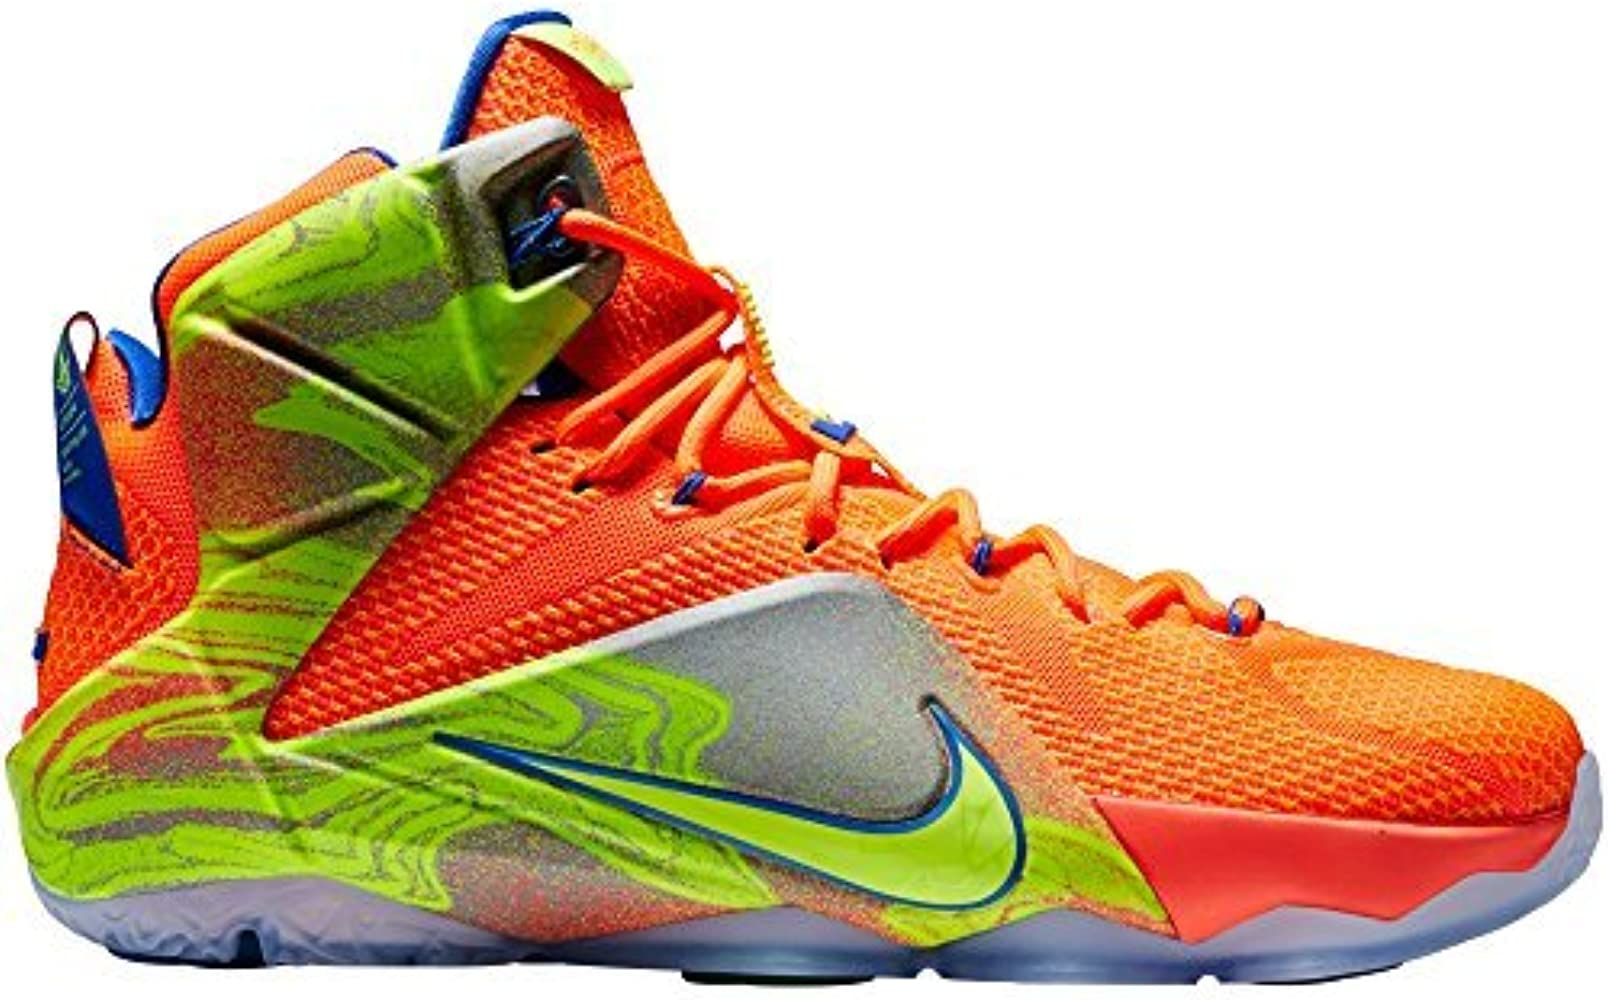 Nike Lebron 12 XII Dunk Force Dunkman